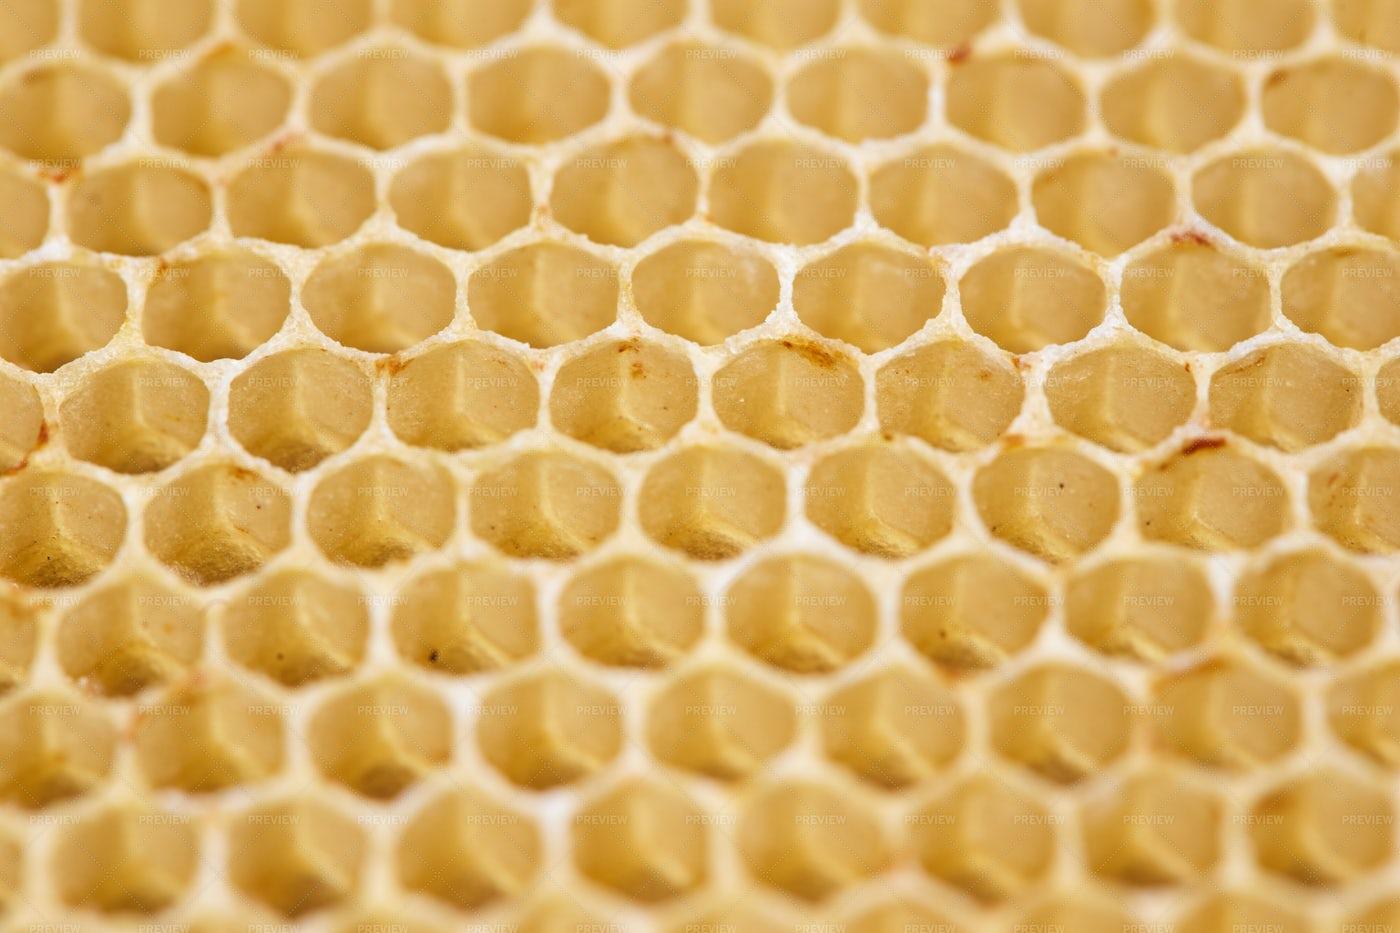 Honeycomb Cells Macro: Stock Photos